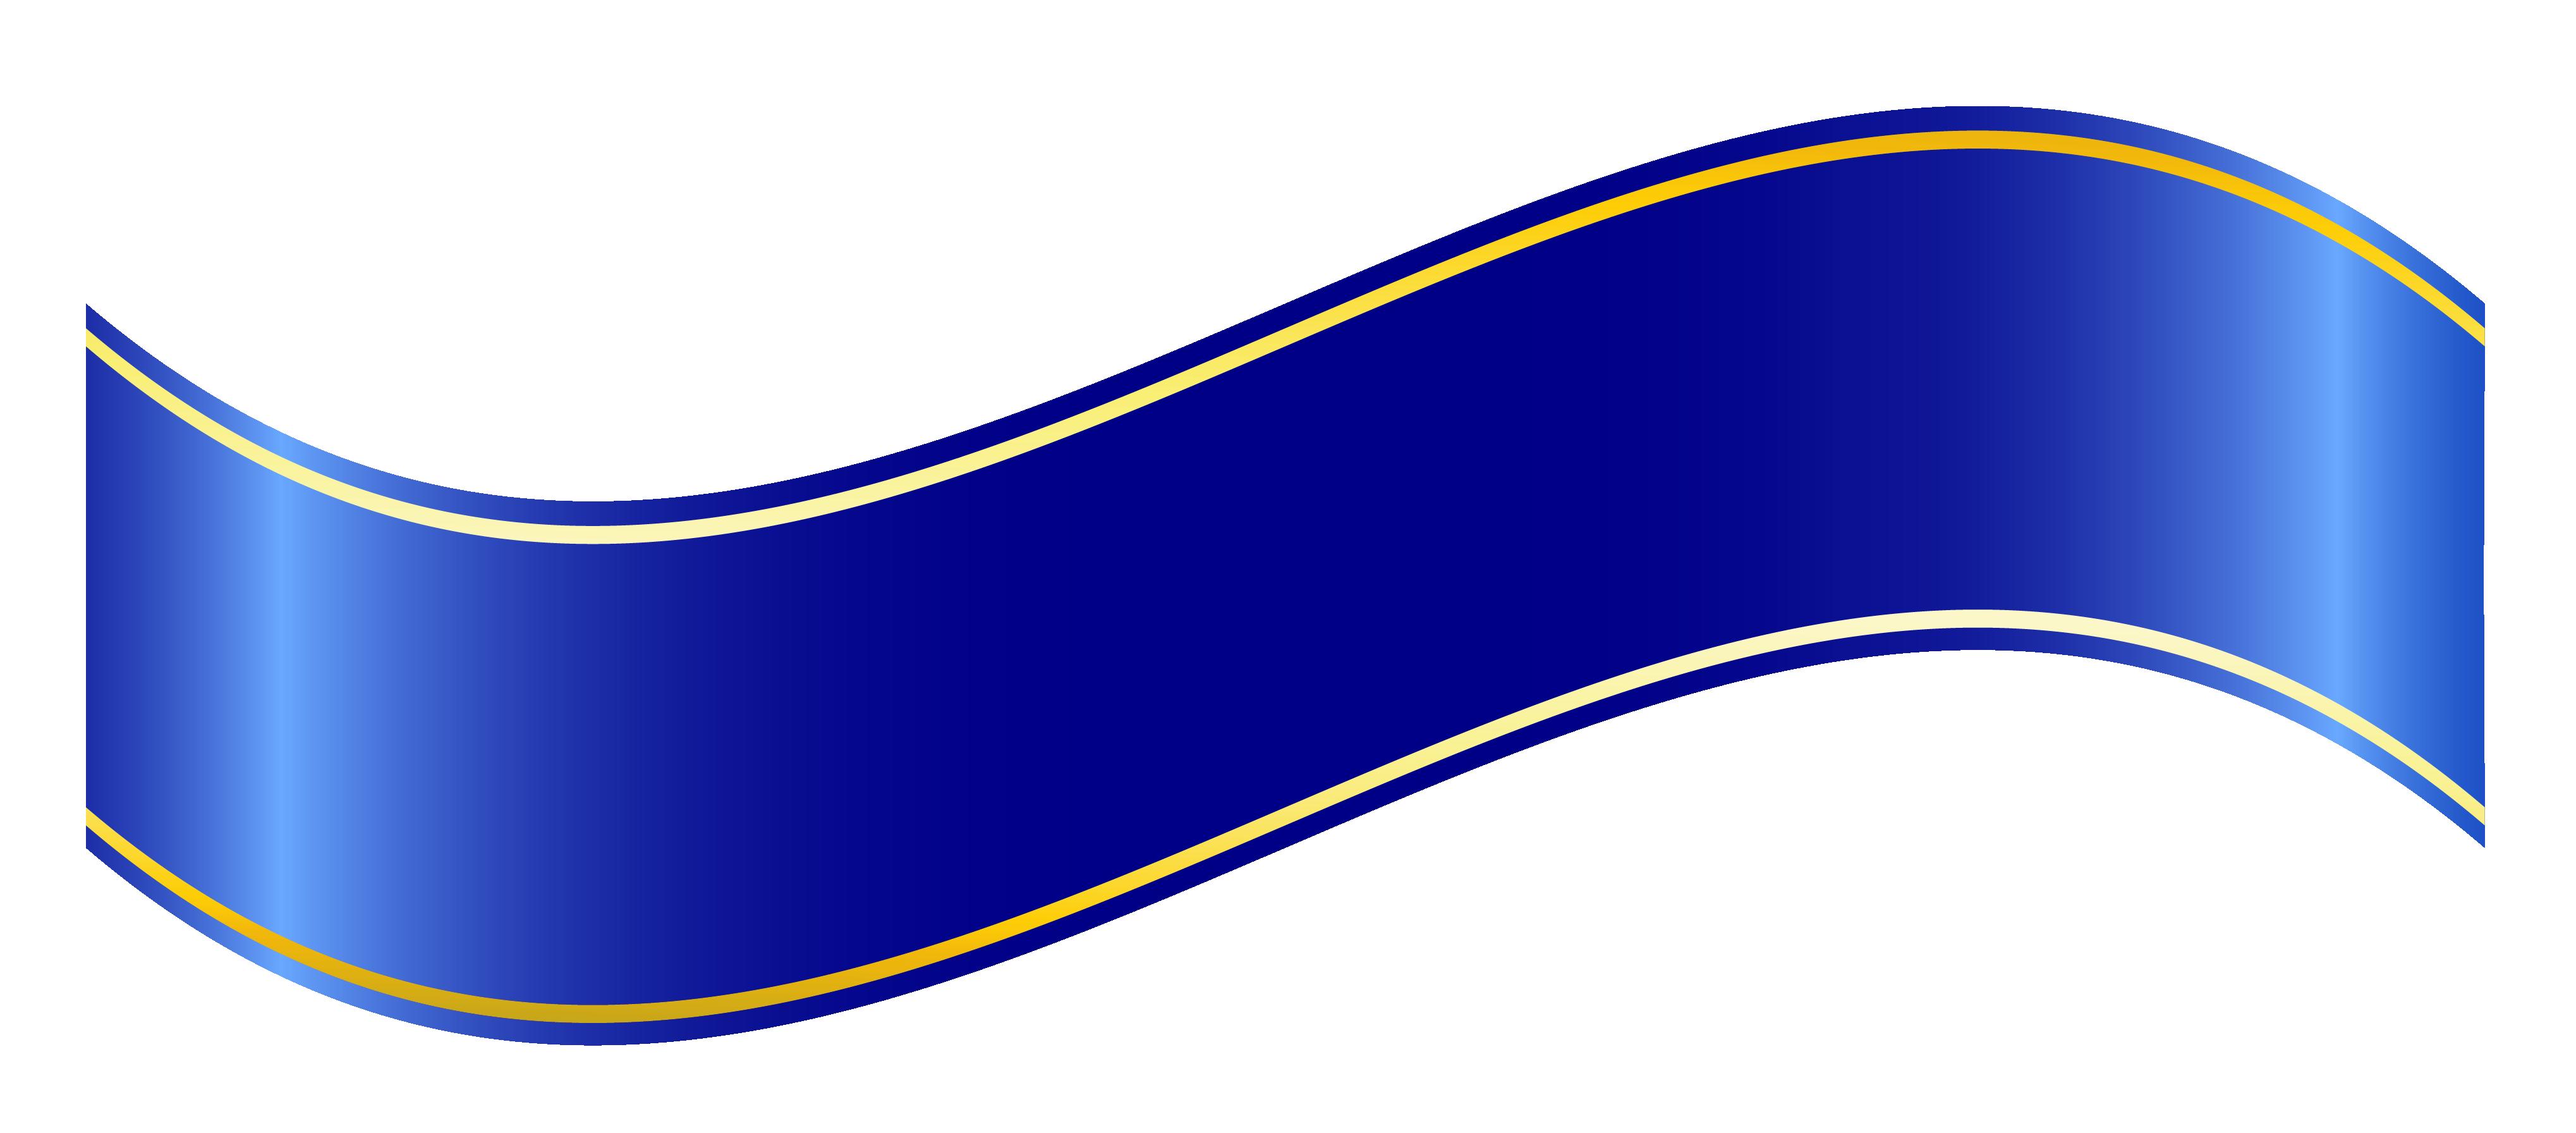 Blue Wavy Line - ClipArt Best